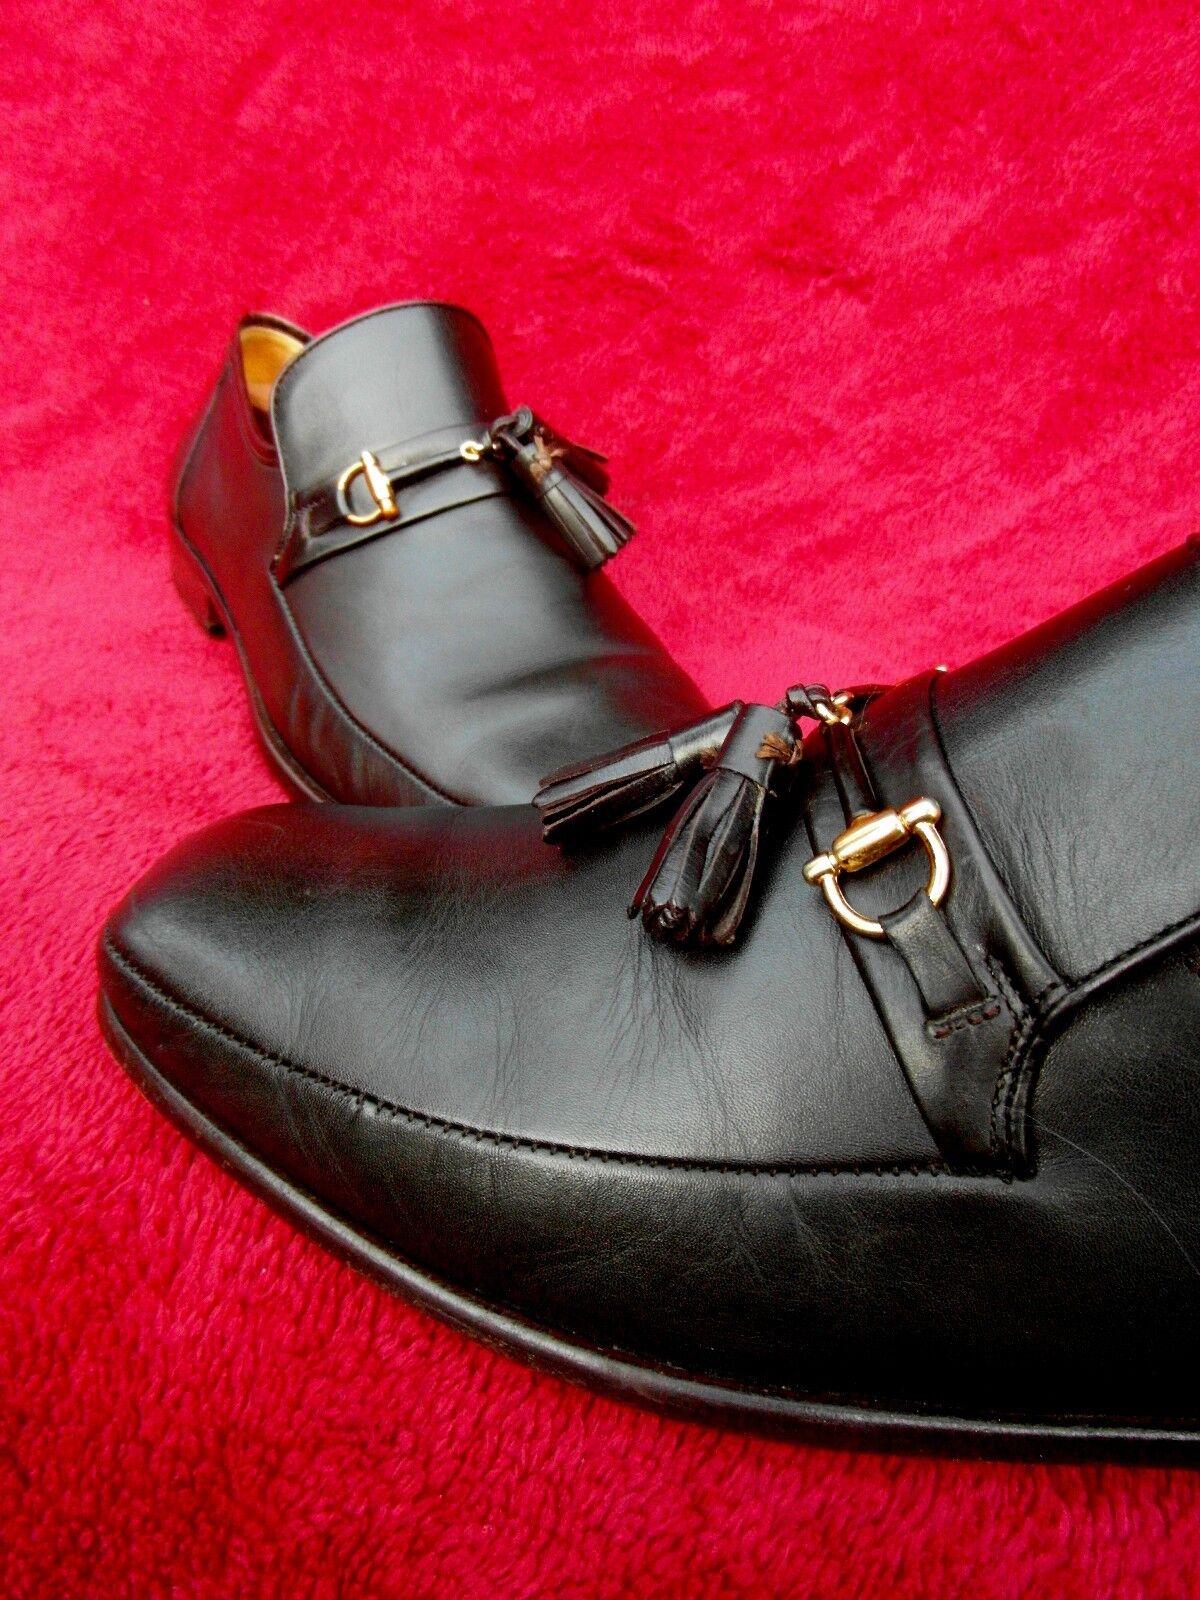 Billig gute Qualität Qualität gute Raphael-Penny Loafer-feinstes Büffelleder-Handarbeit-41-Eleganzfaktor-TOP 57b0e1